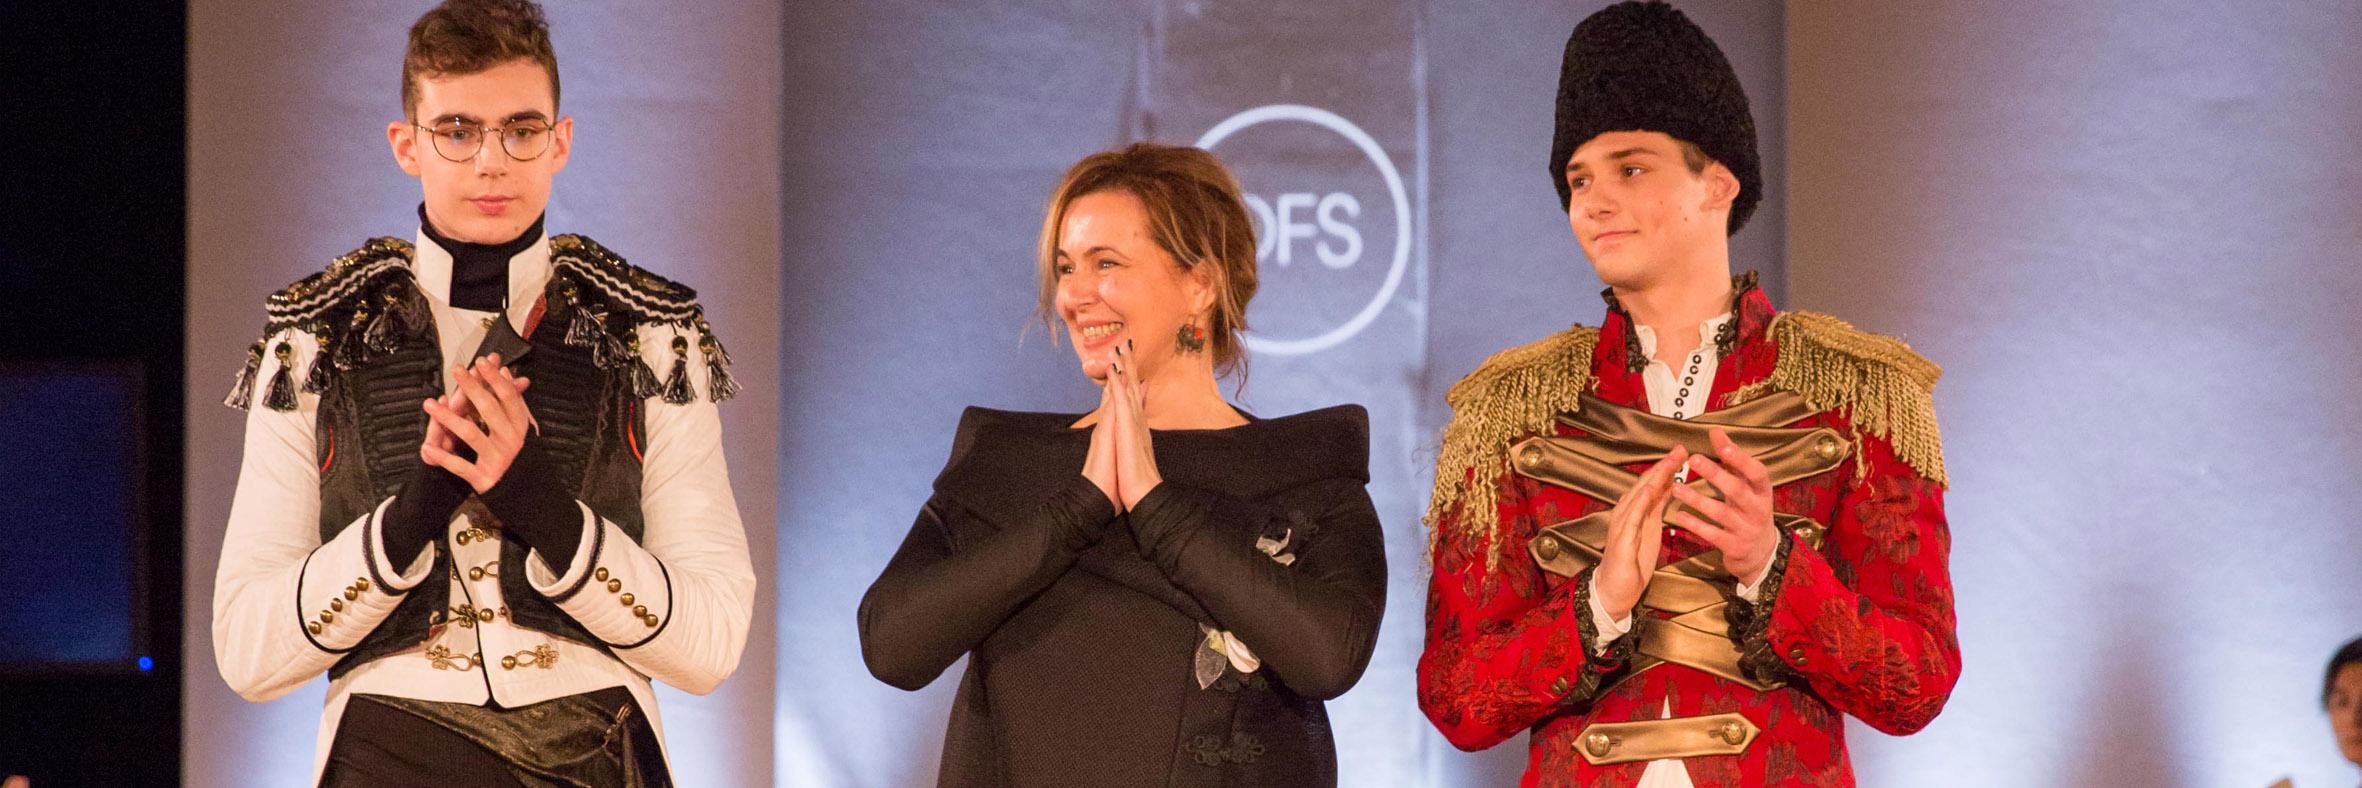 Contrast - Paris Fashion Show - Spring/Summer 2017